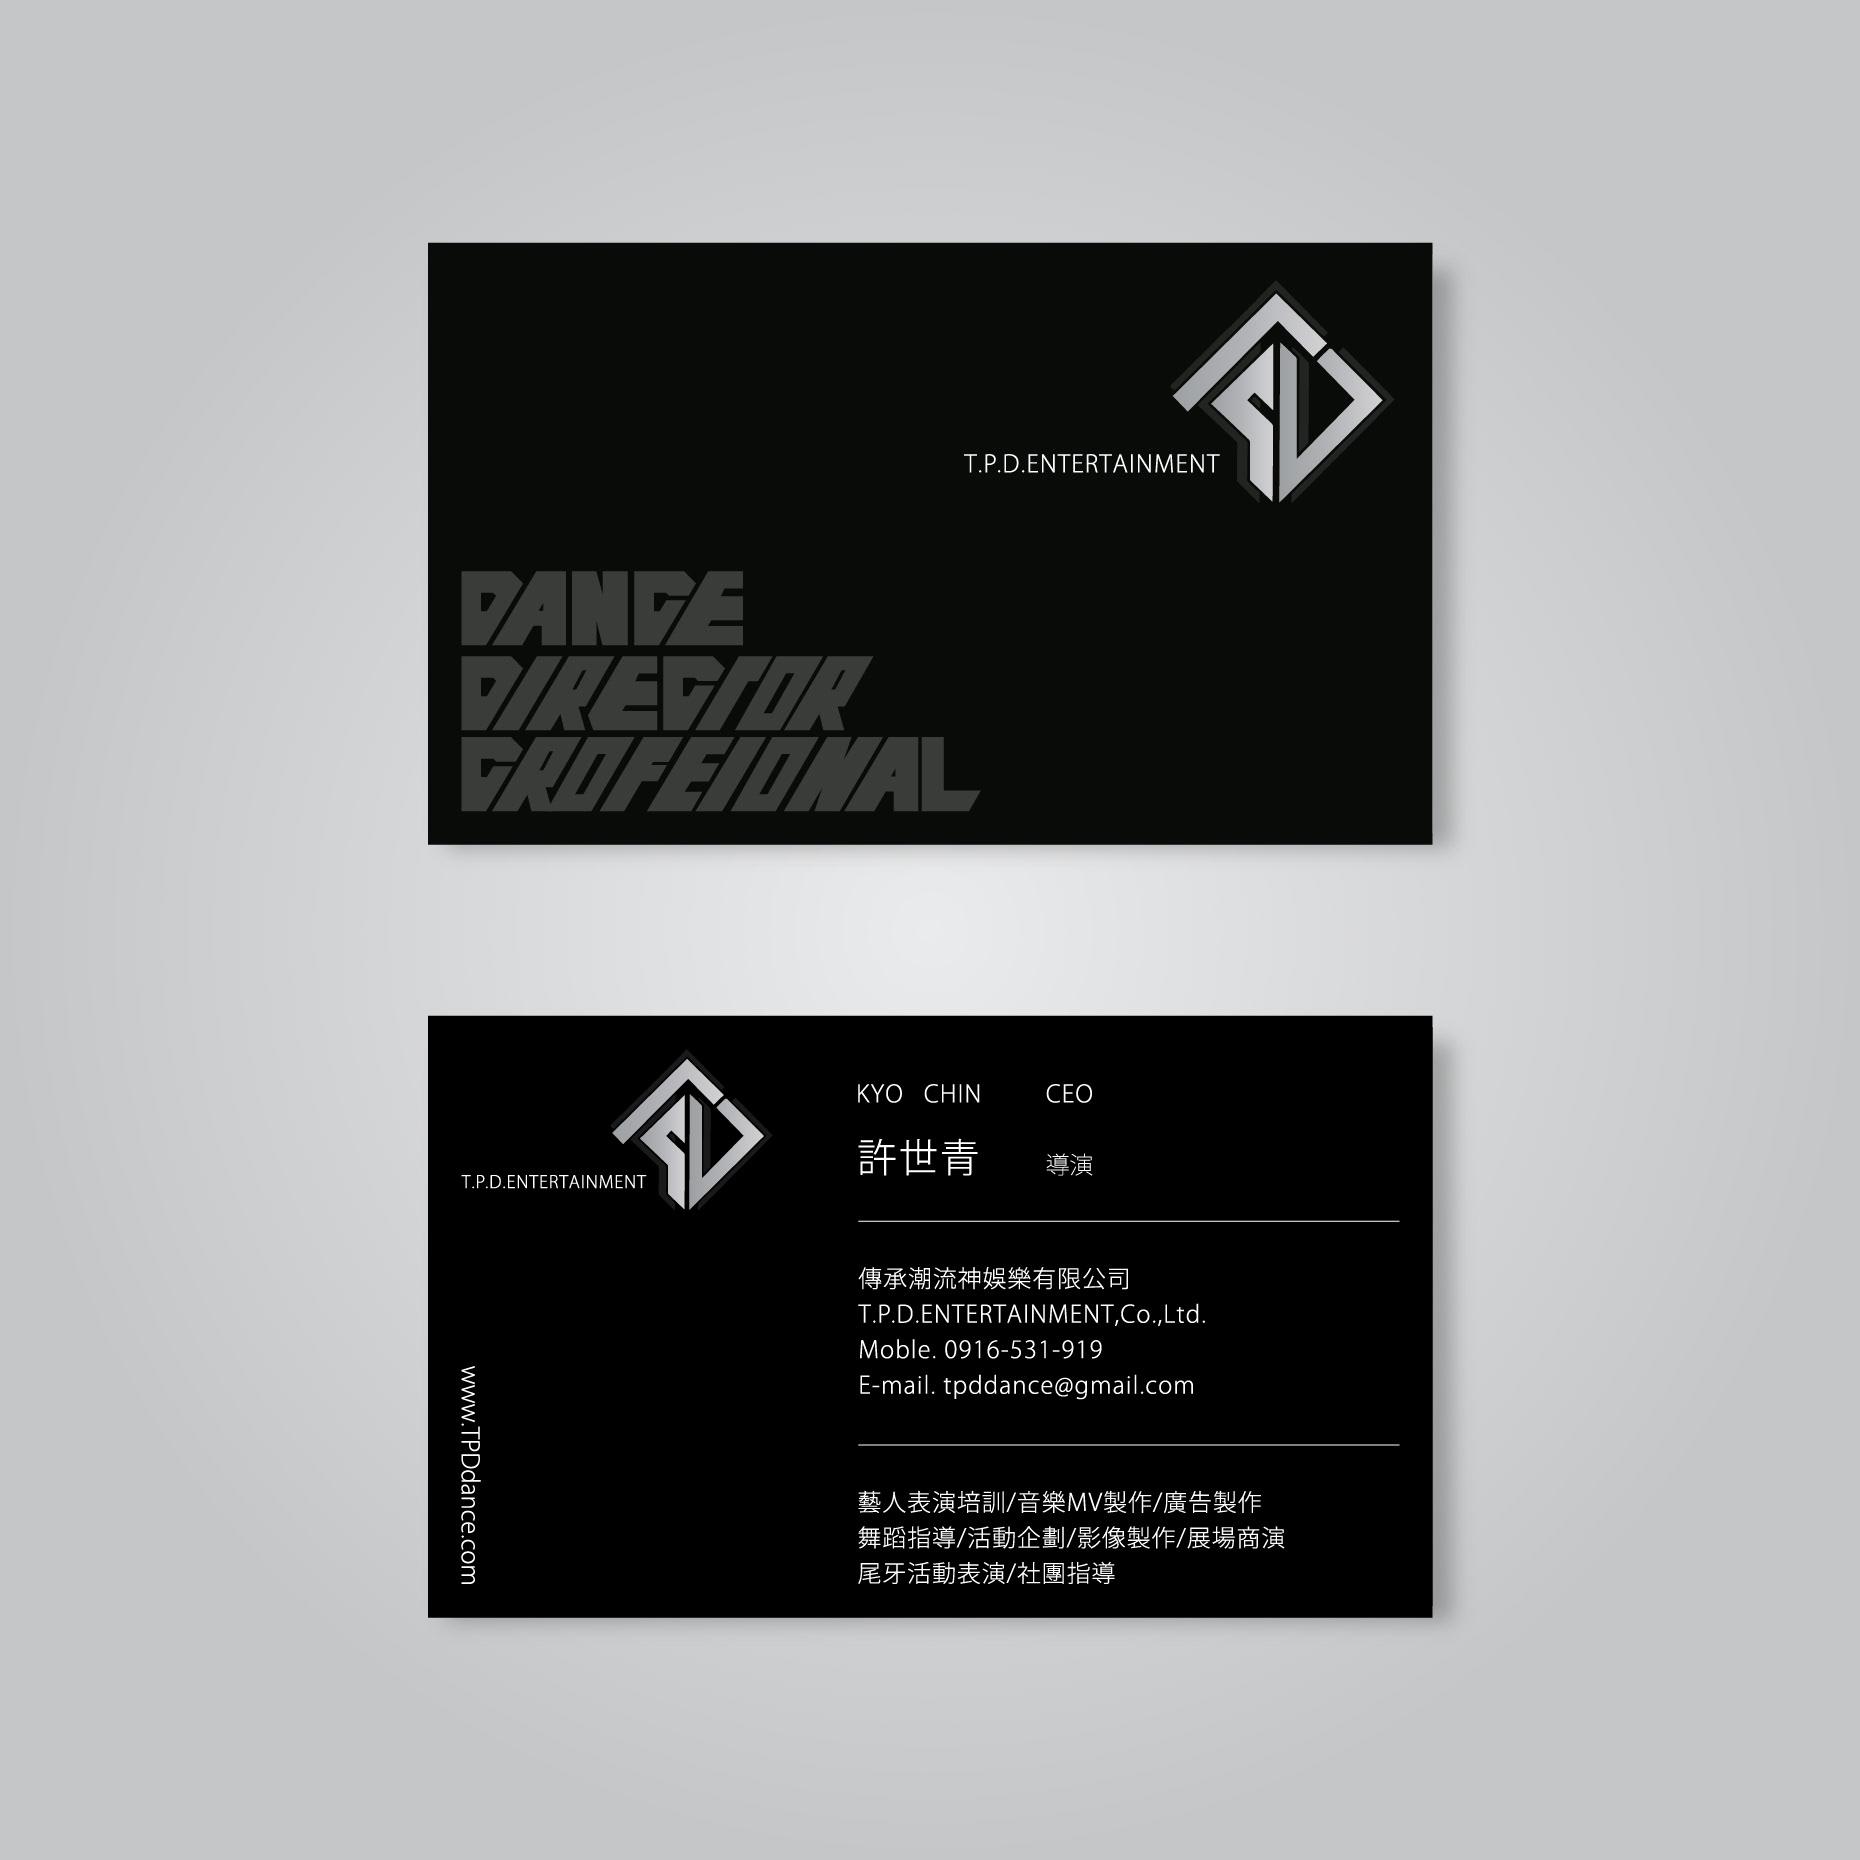 Sebastian Huang - TPD / Business Card